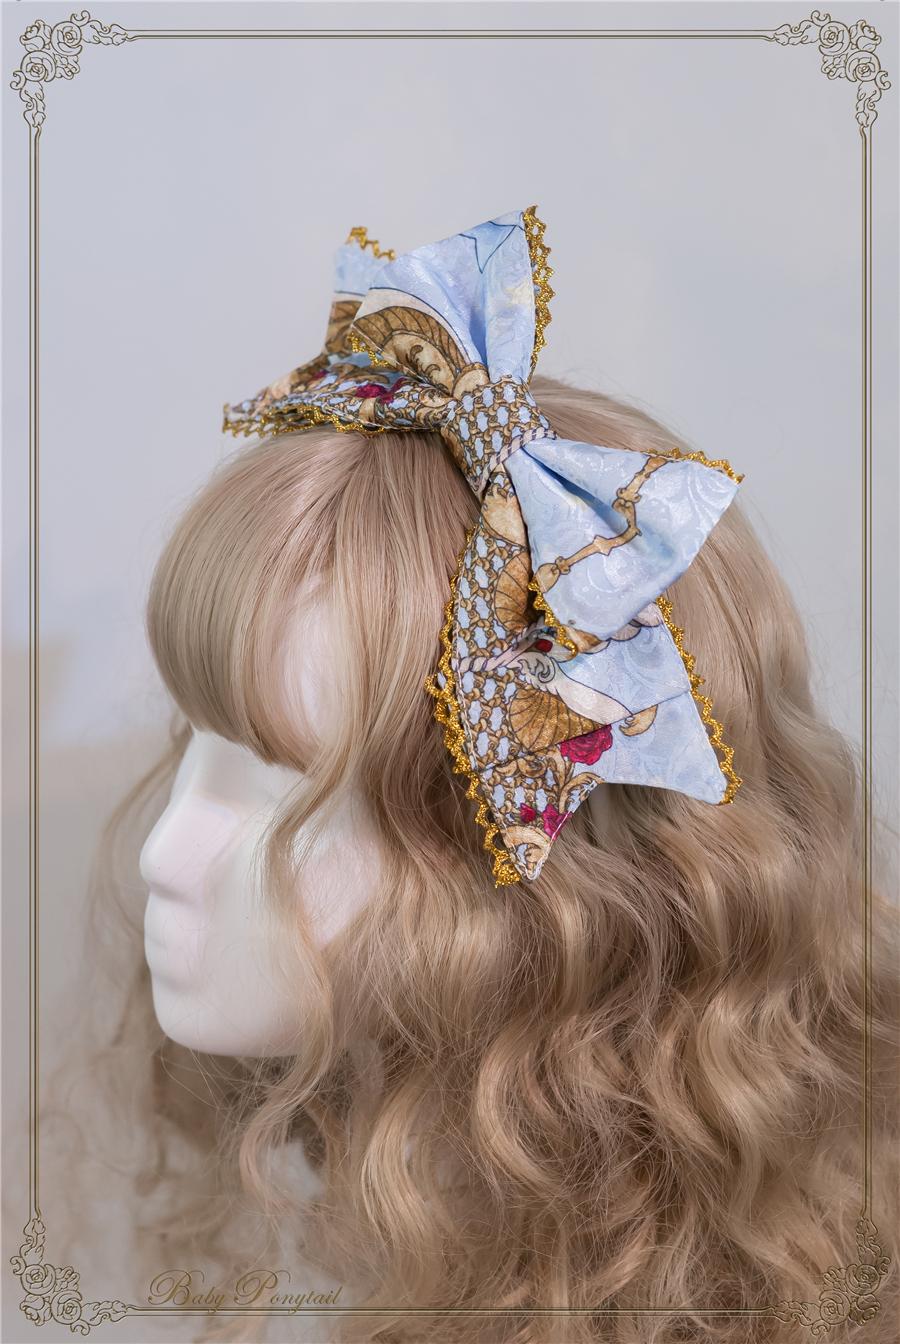 Baby Ponytail_Stock photo_Circus Princess_KC Sax_03.jpg